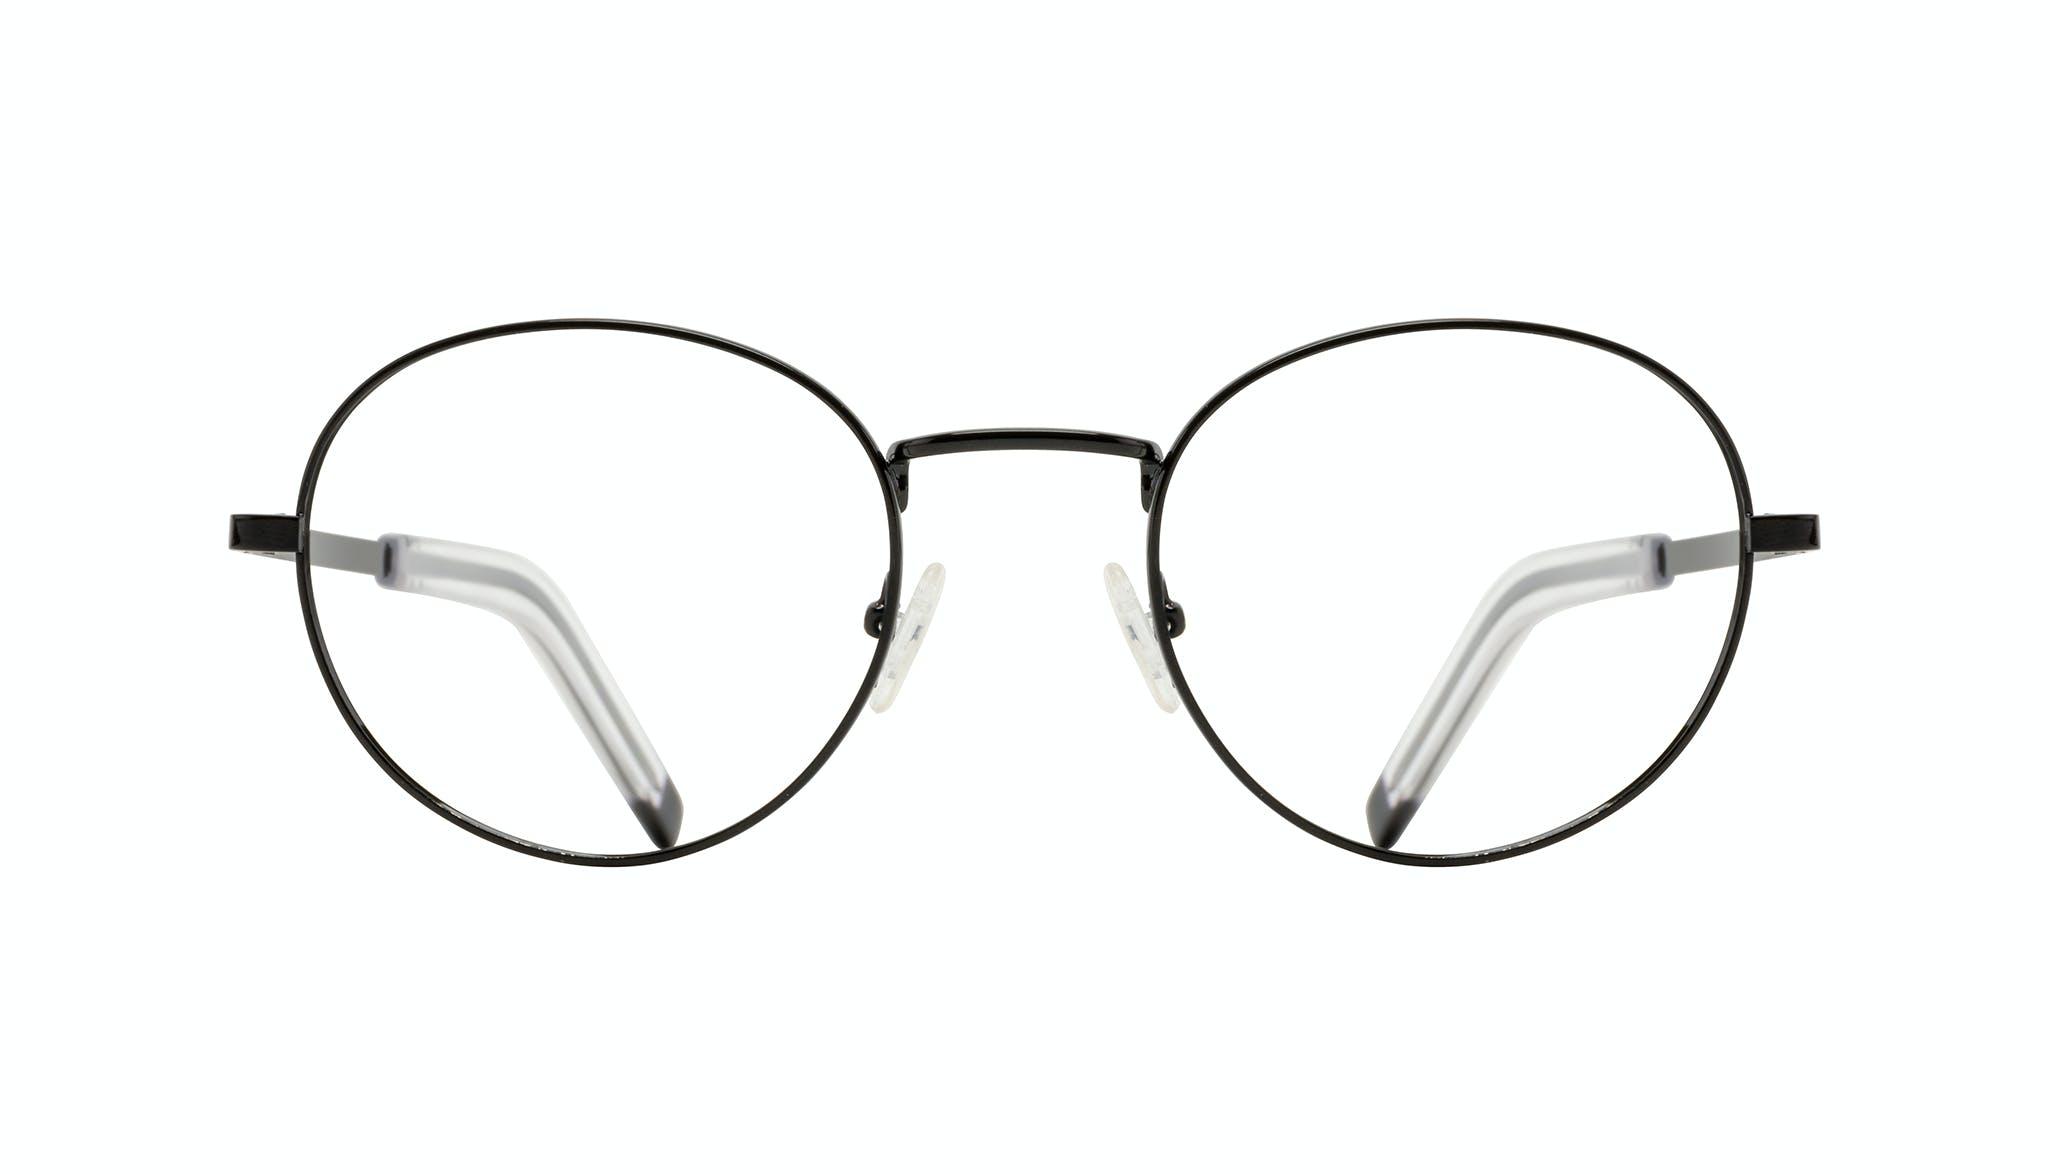 Affordable Fashion Glasses Round Eyeglasses Men Lean XL Black Front